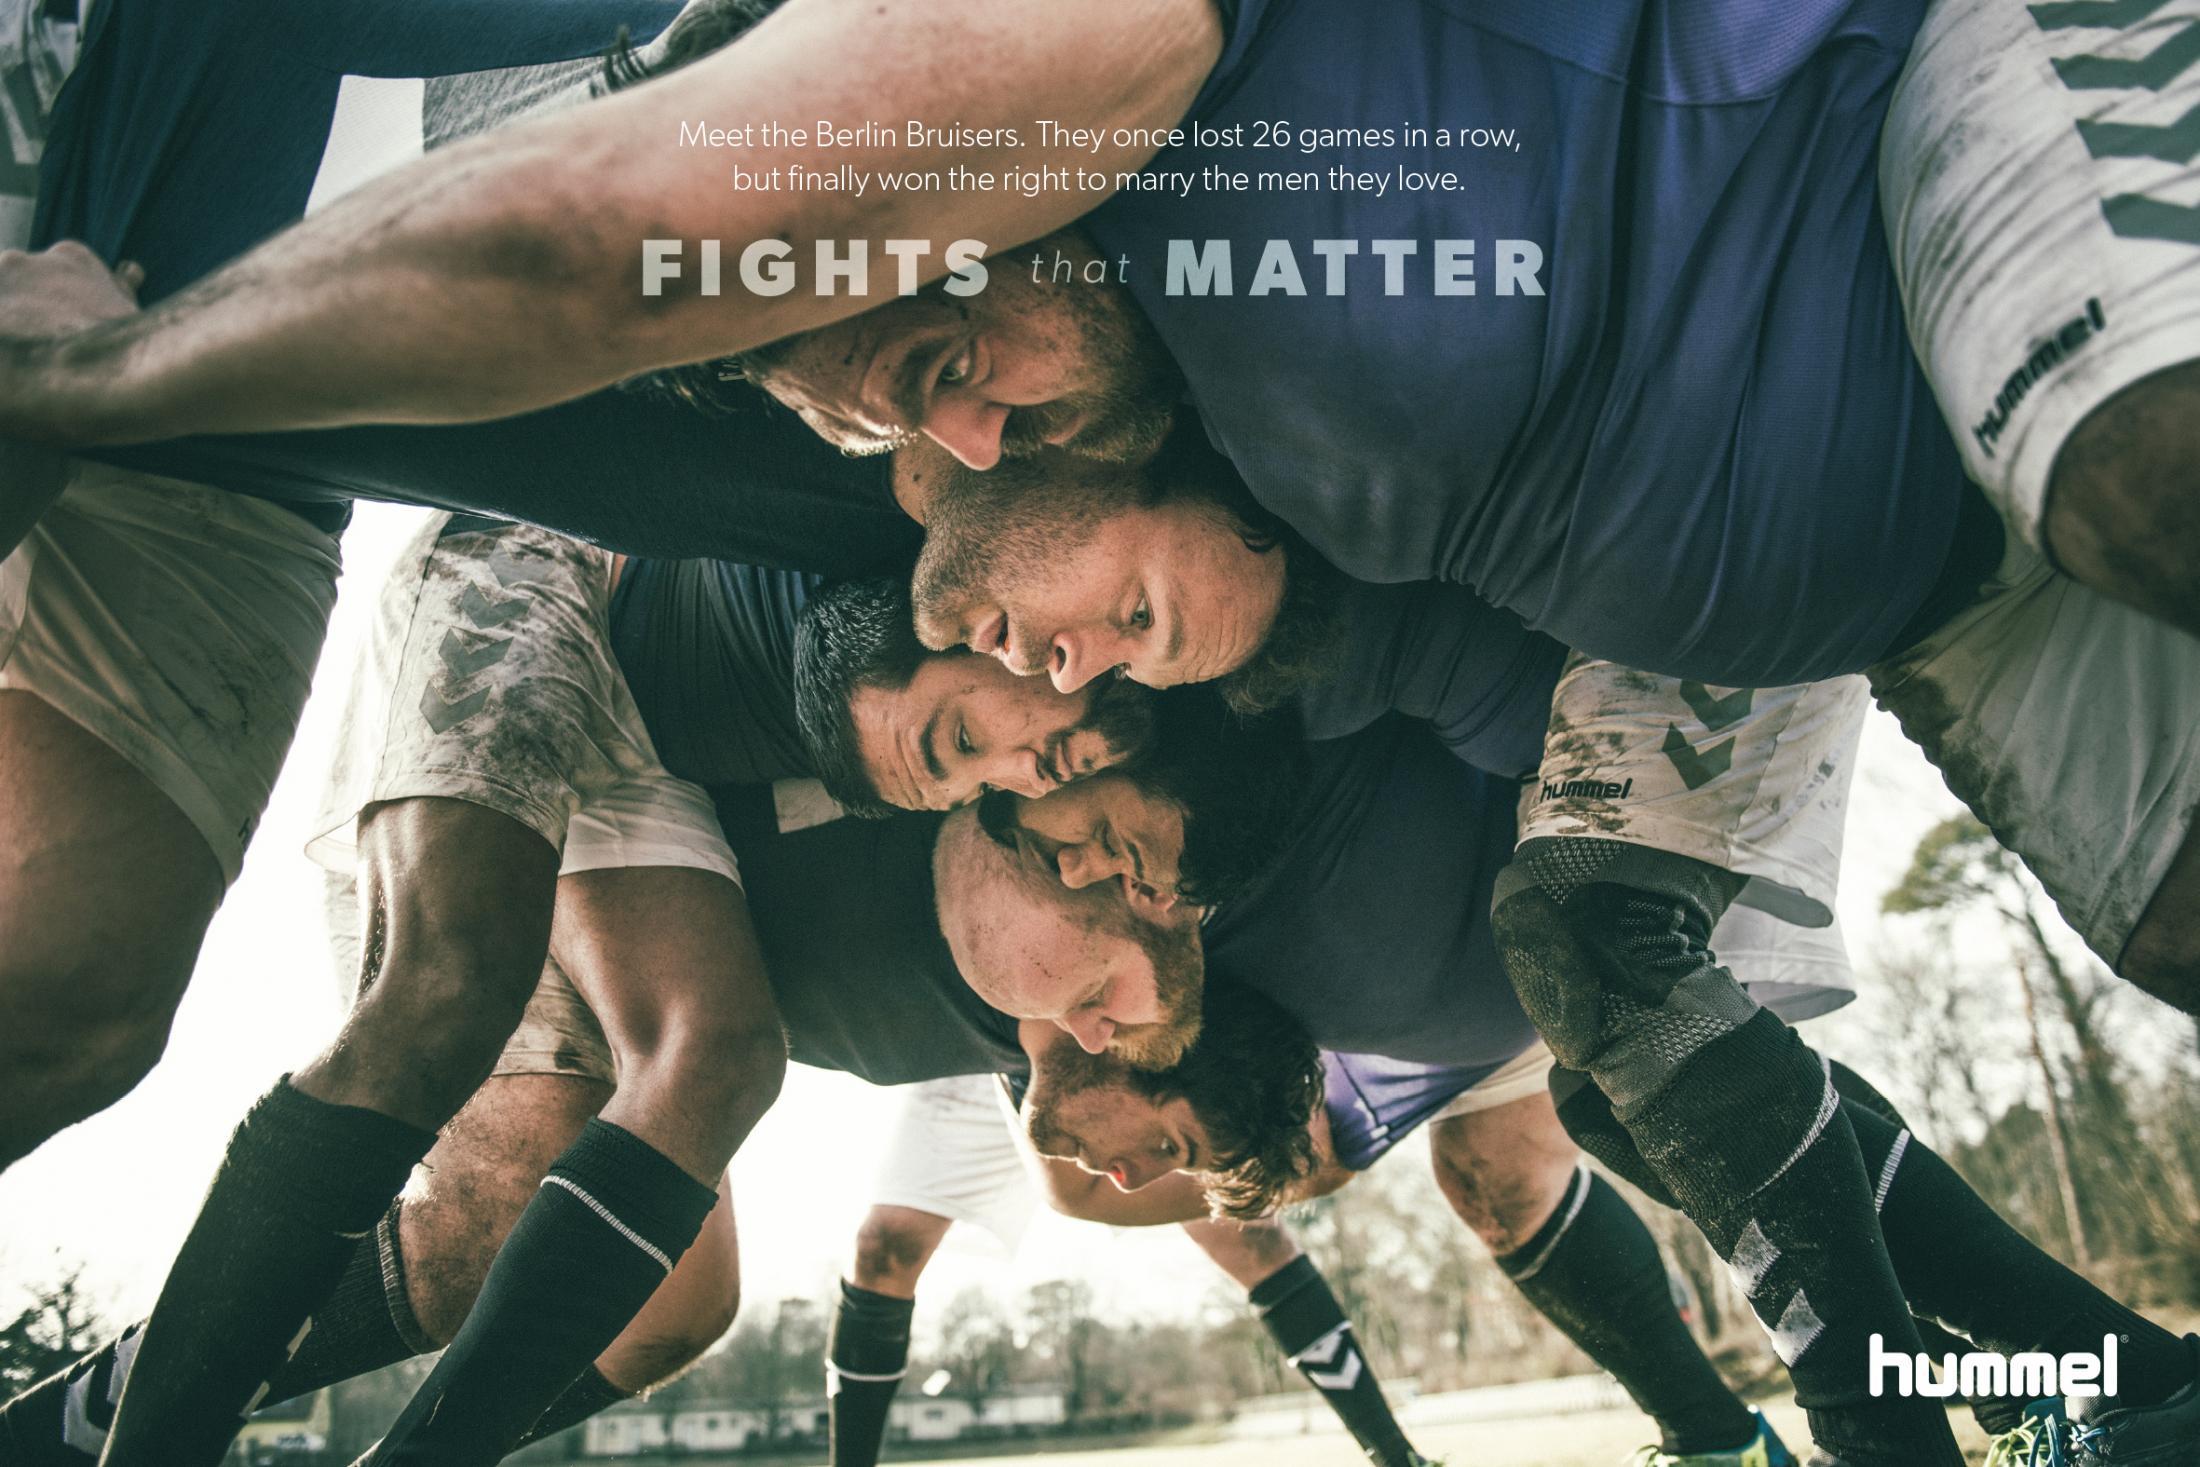 Hummel Print Ad - Fights That Matter - Bruisers